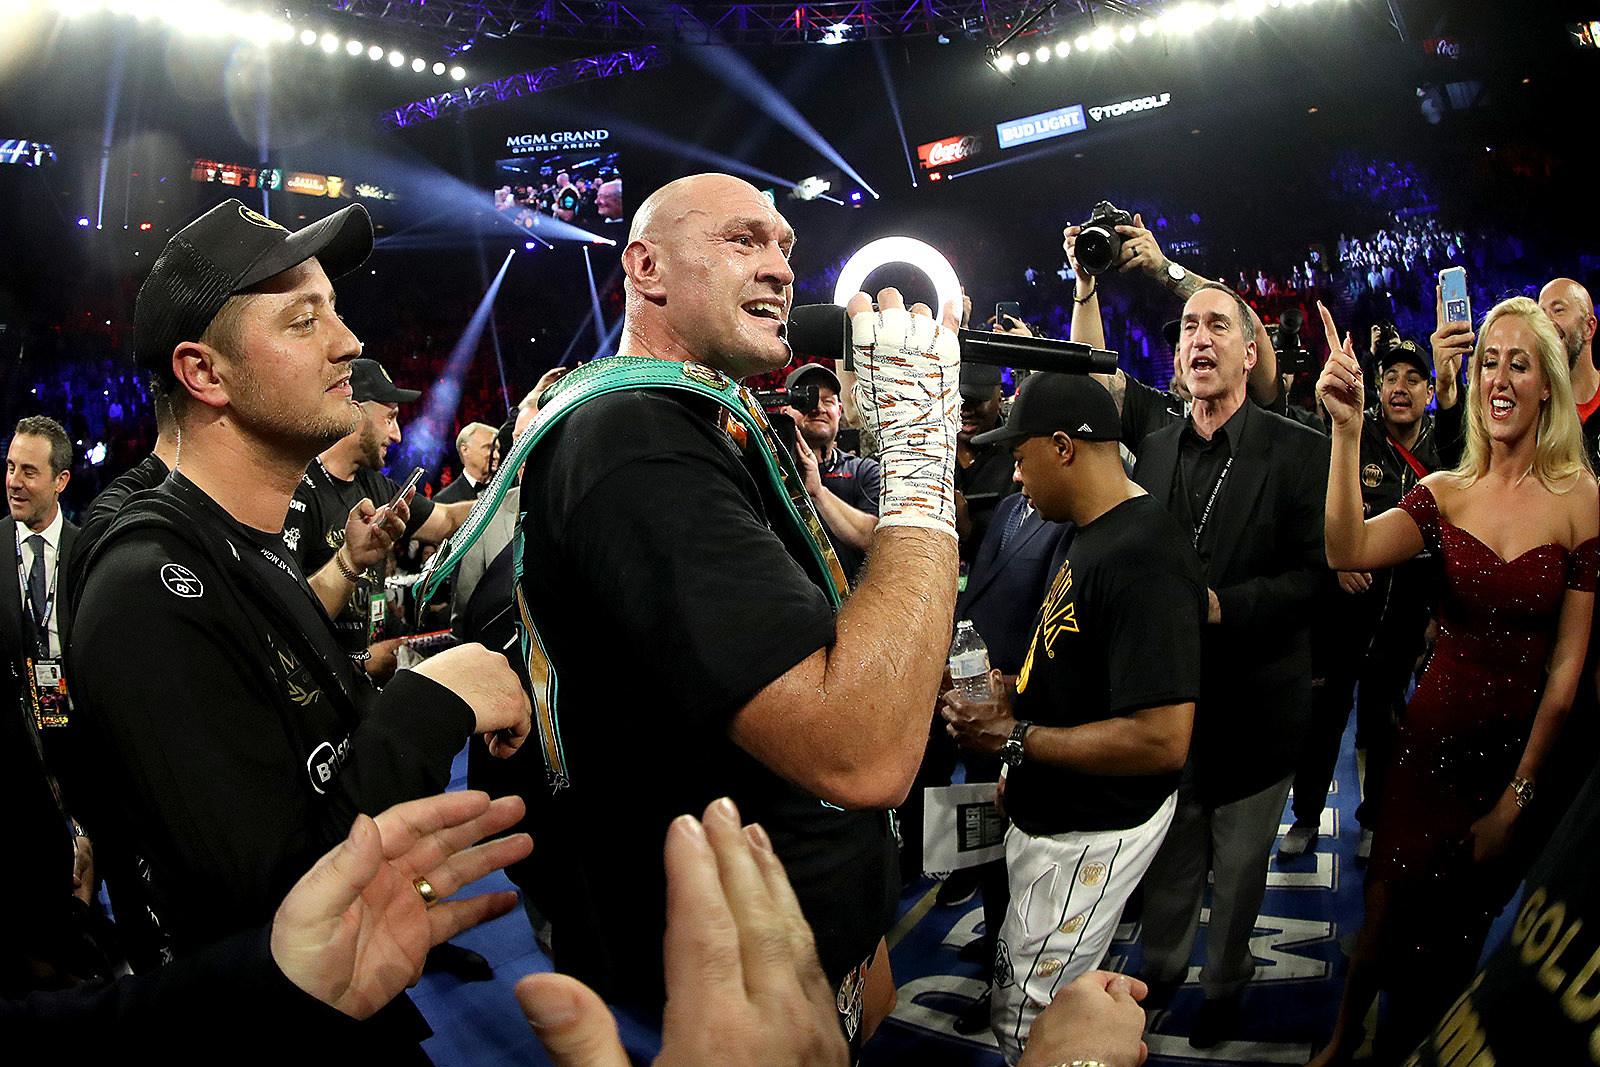 Watch Boxer Tyson Fury Sing 'American Pie' After Heavyweight Title Win